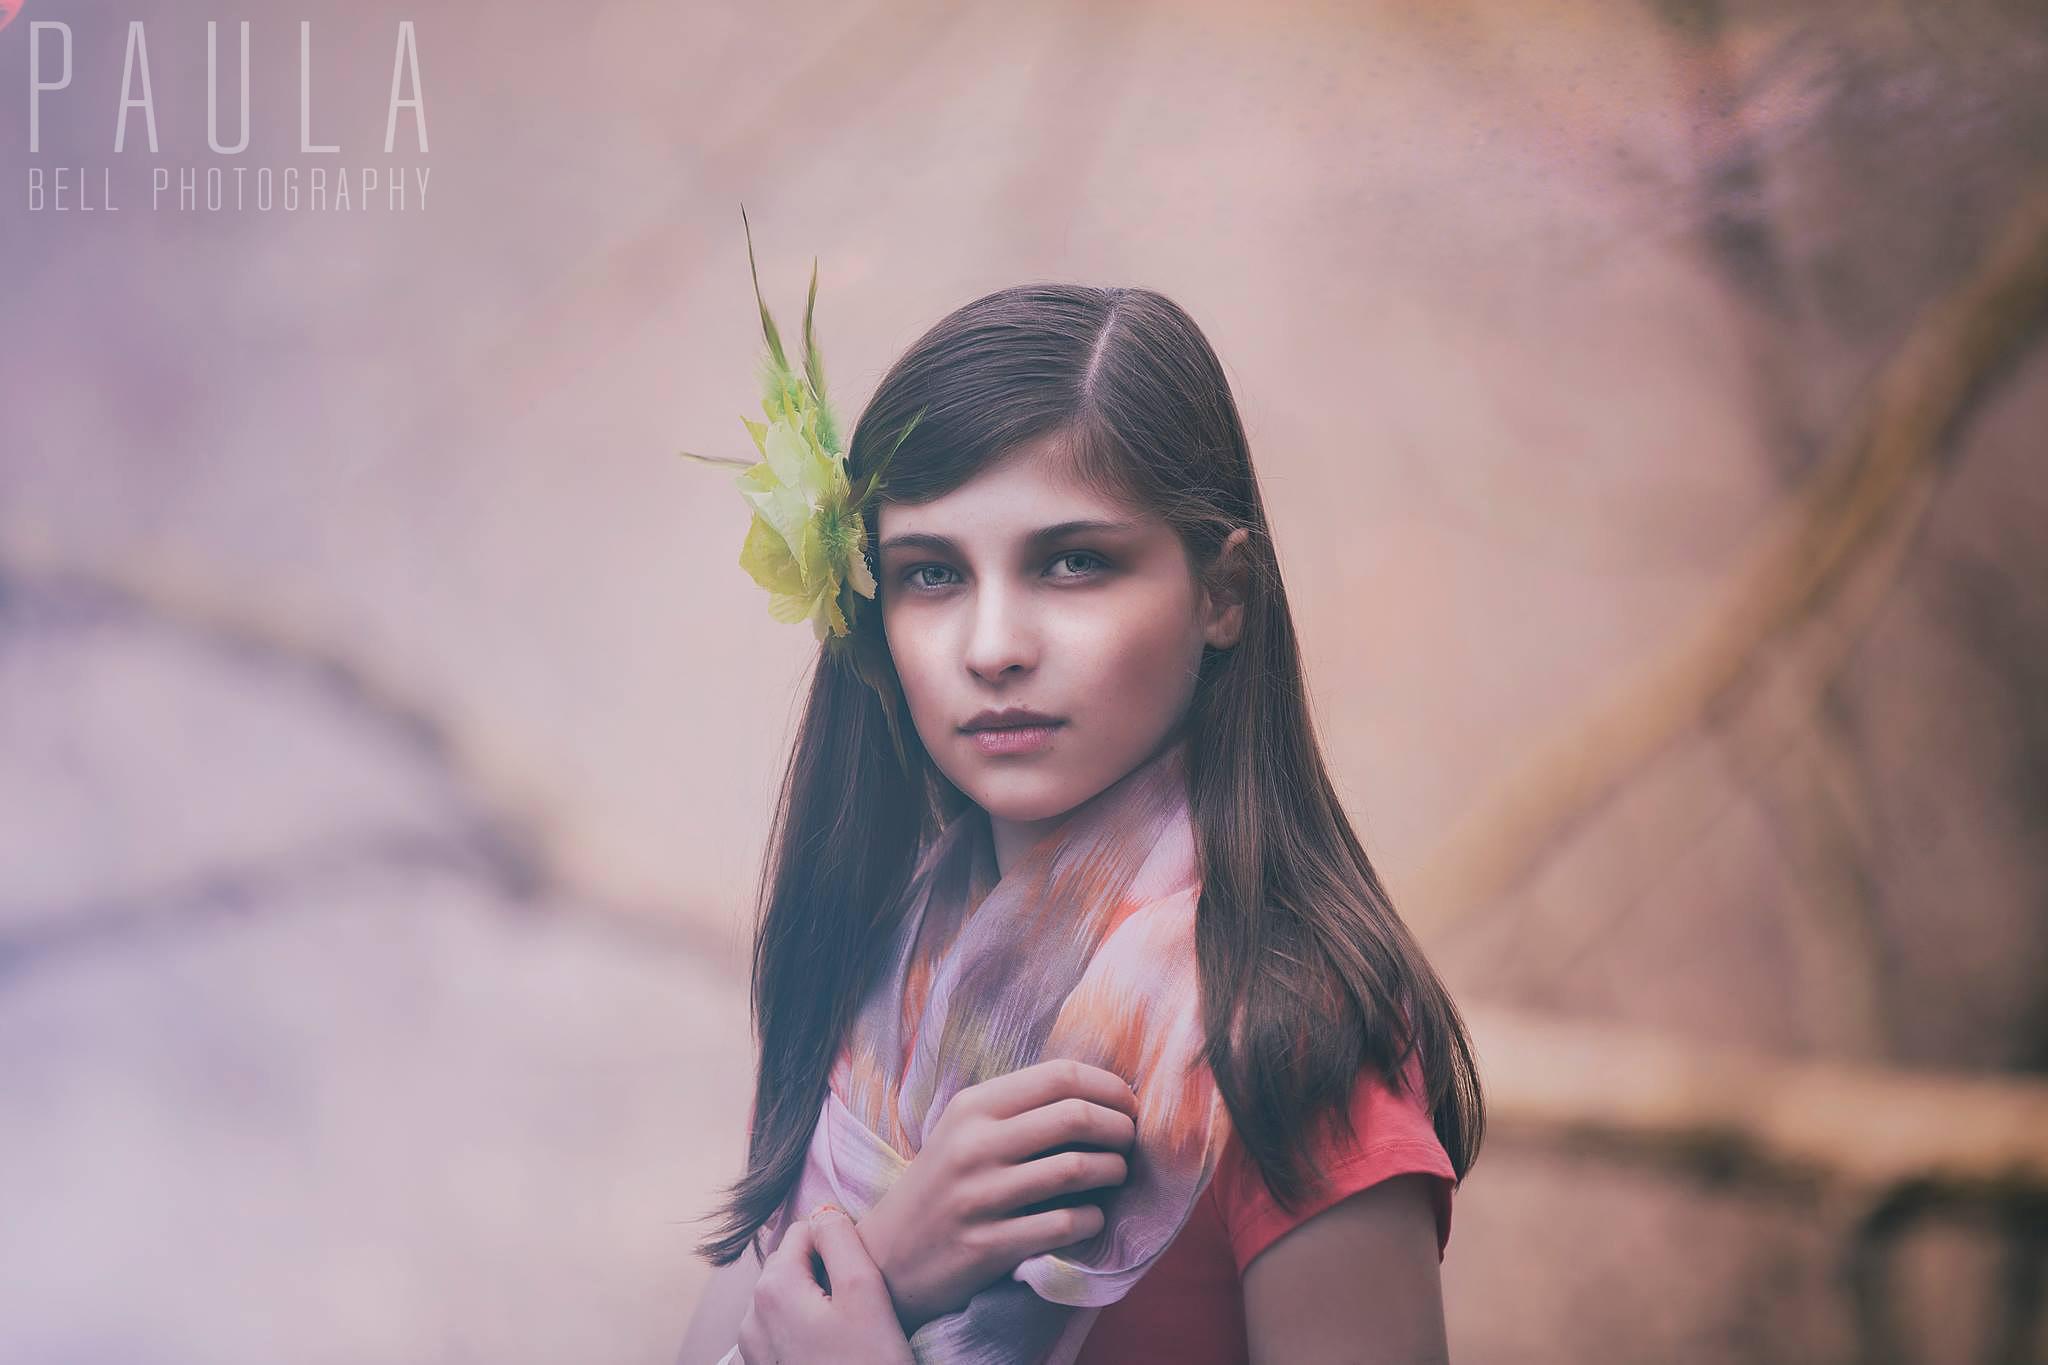 Beauty by PaulaBellPhotography